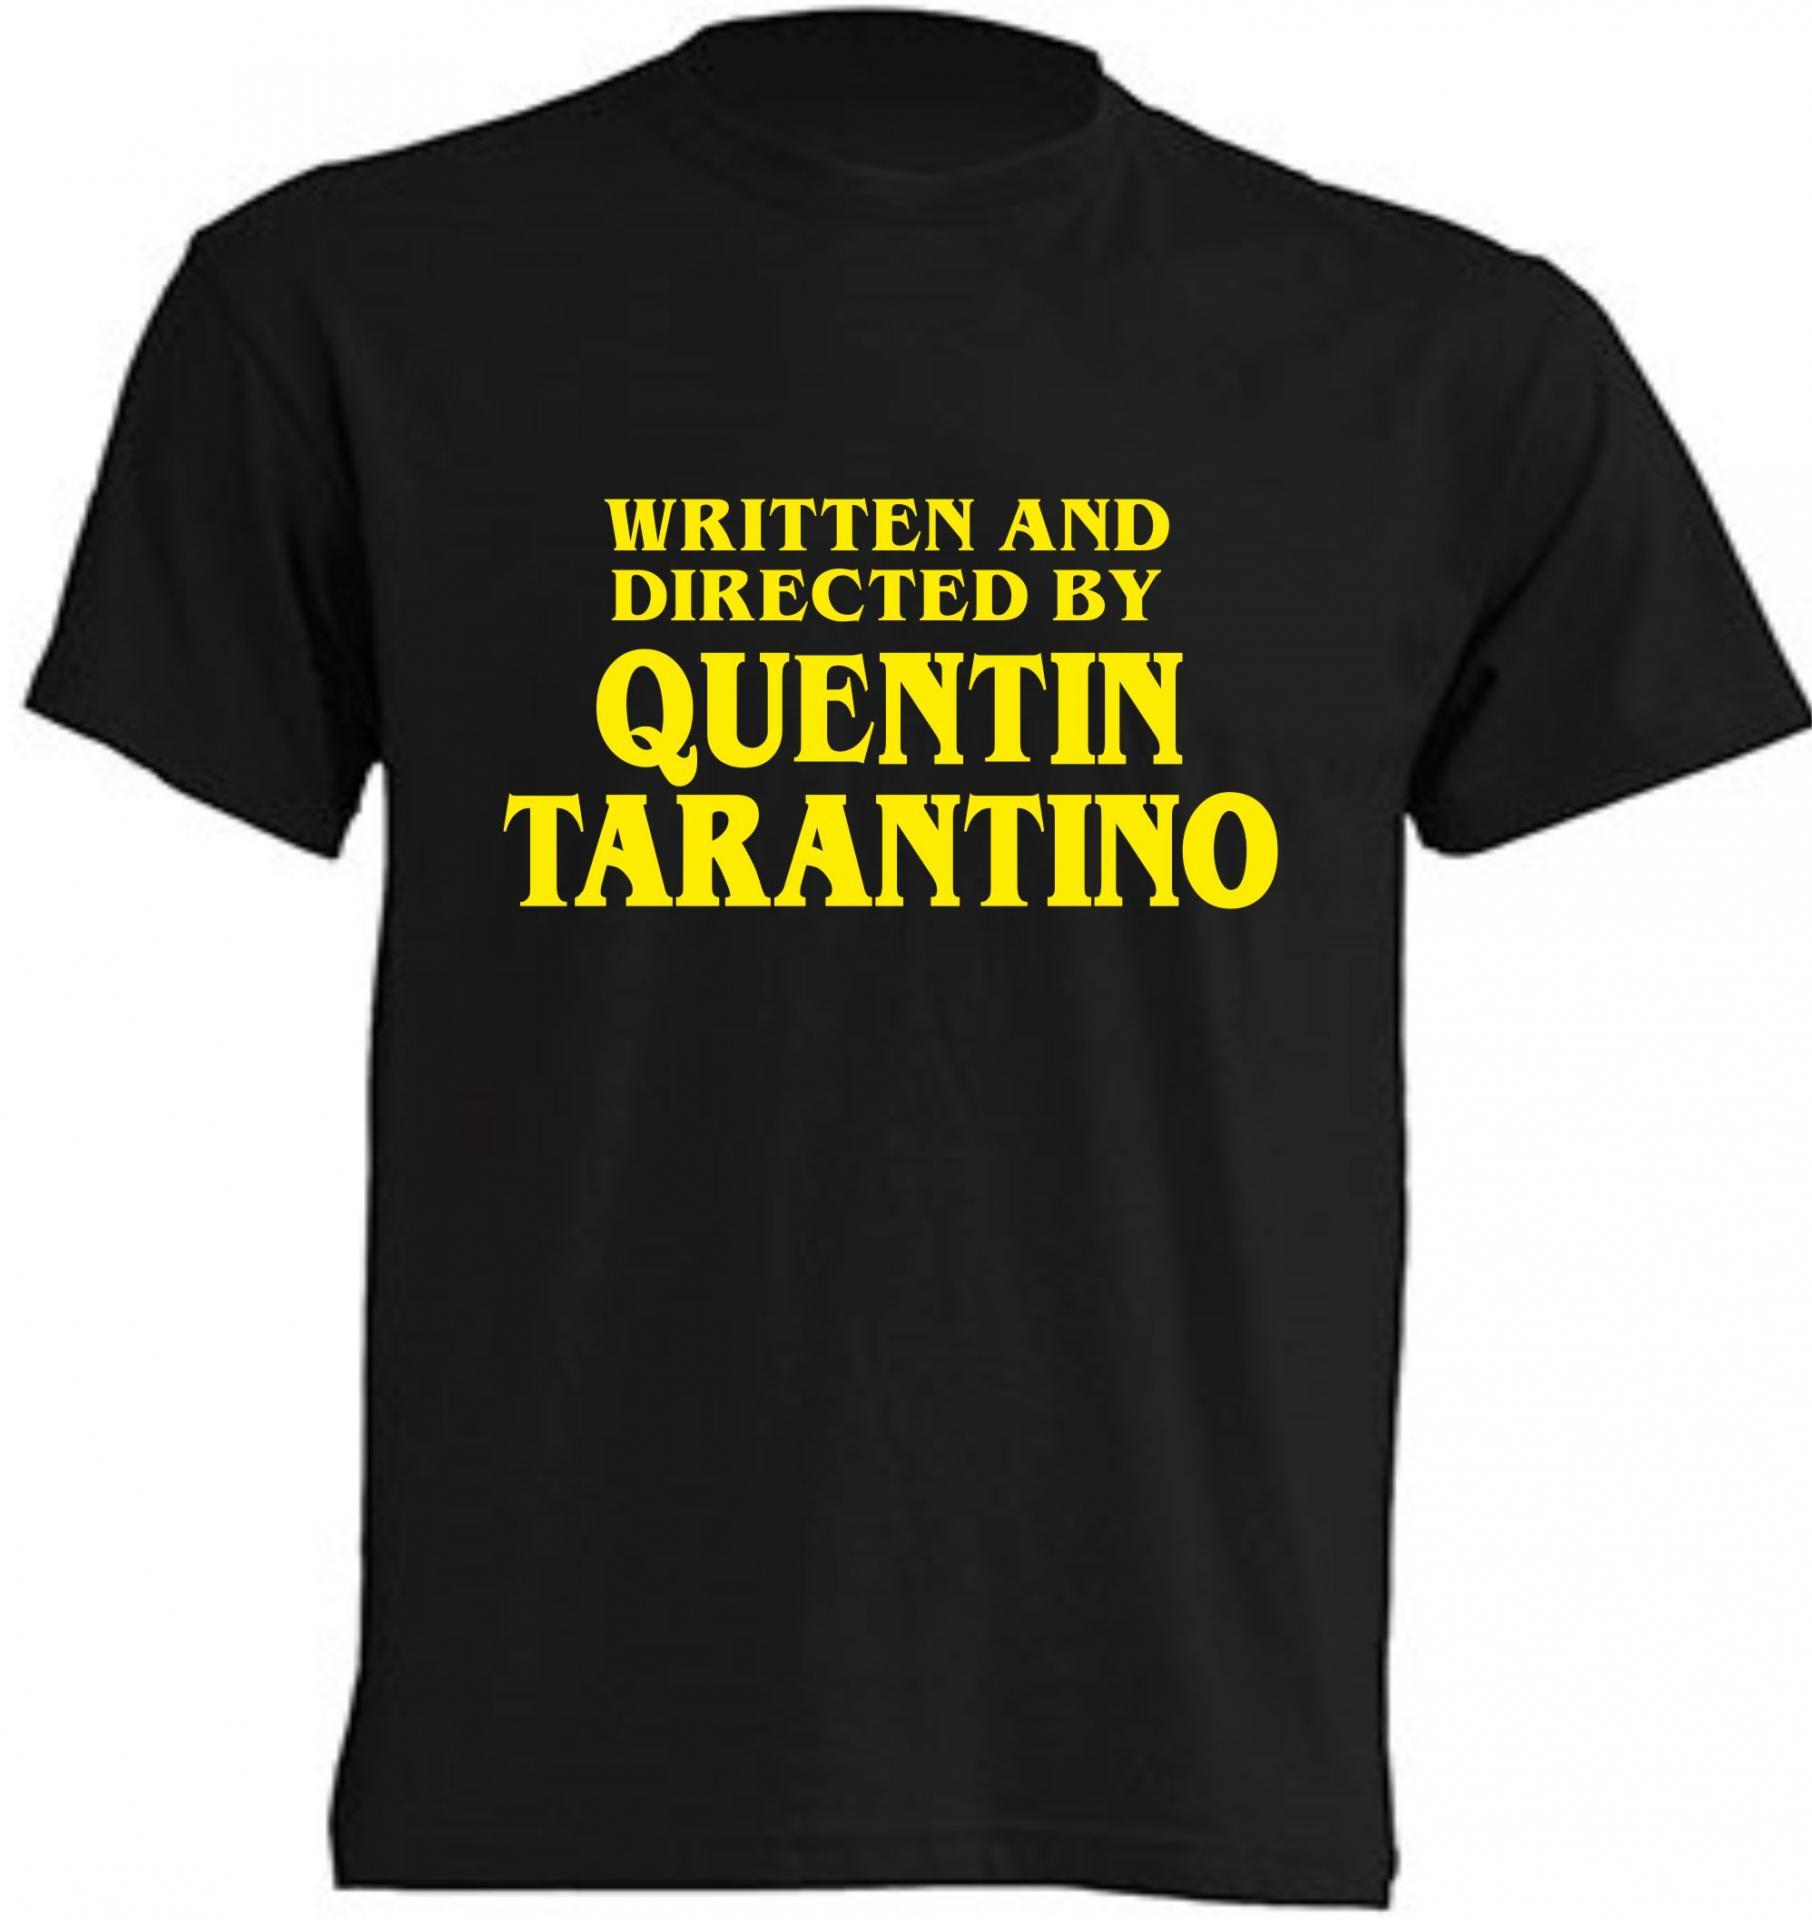 Camiseta Escrita y Dirigida por Quentin Tarantino